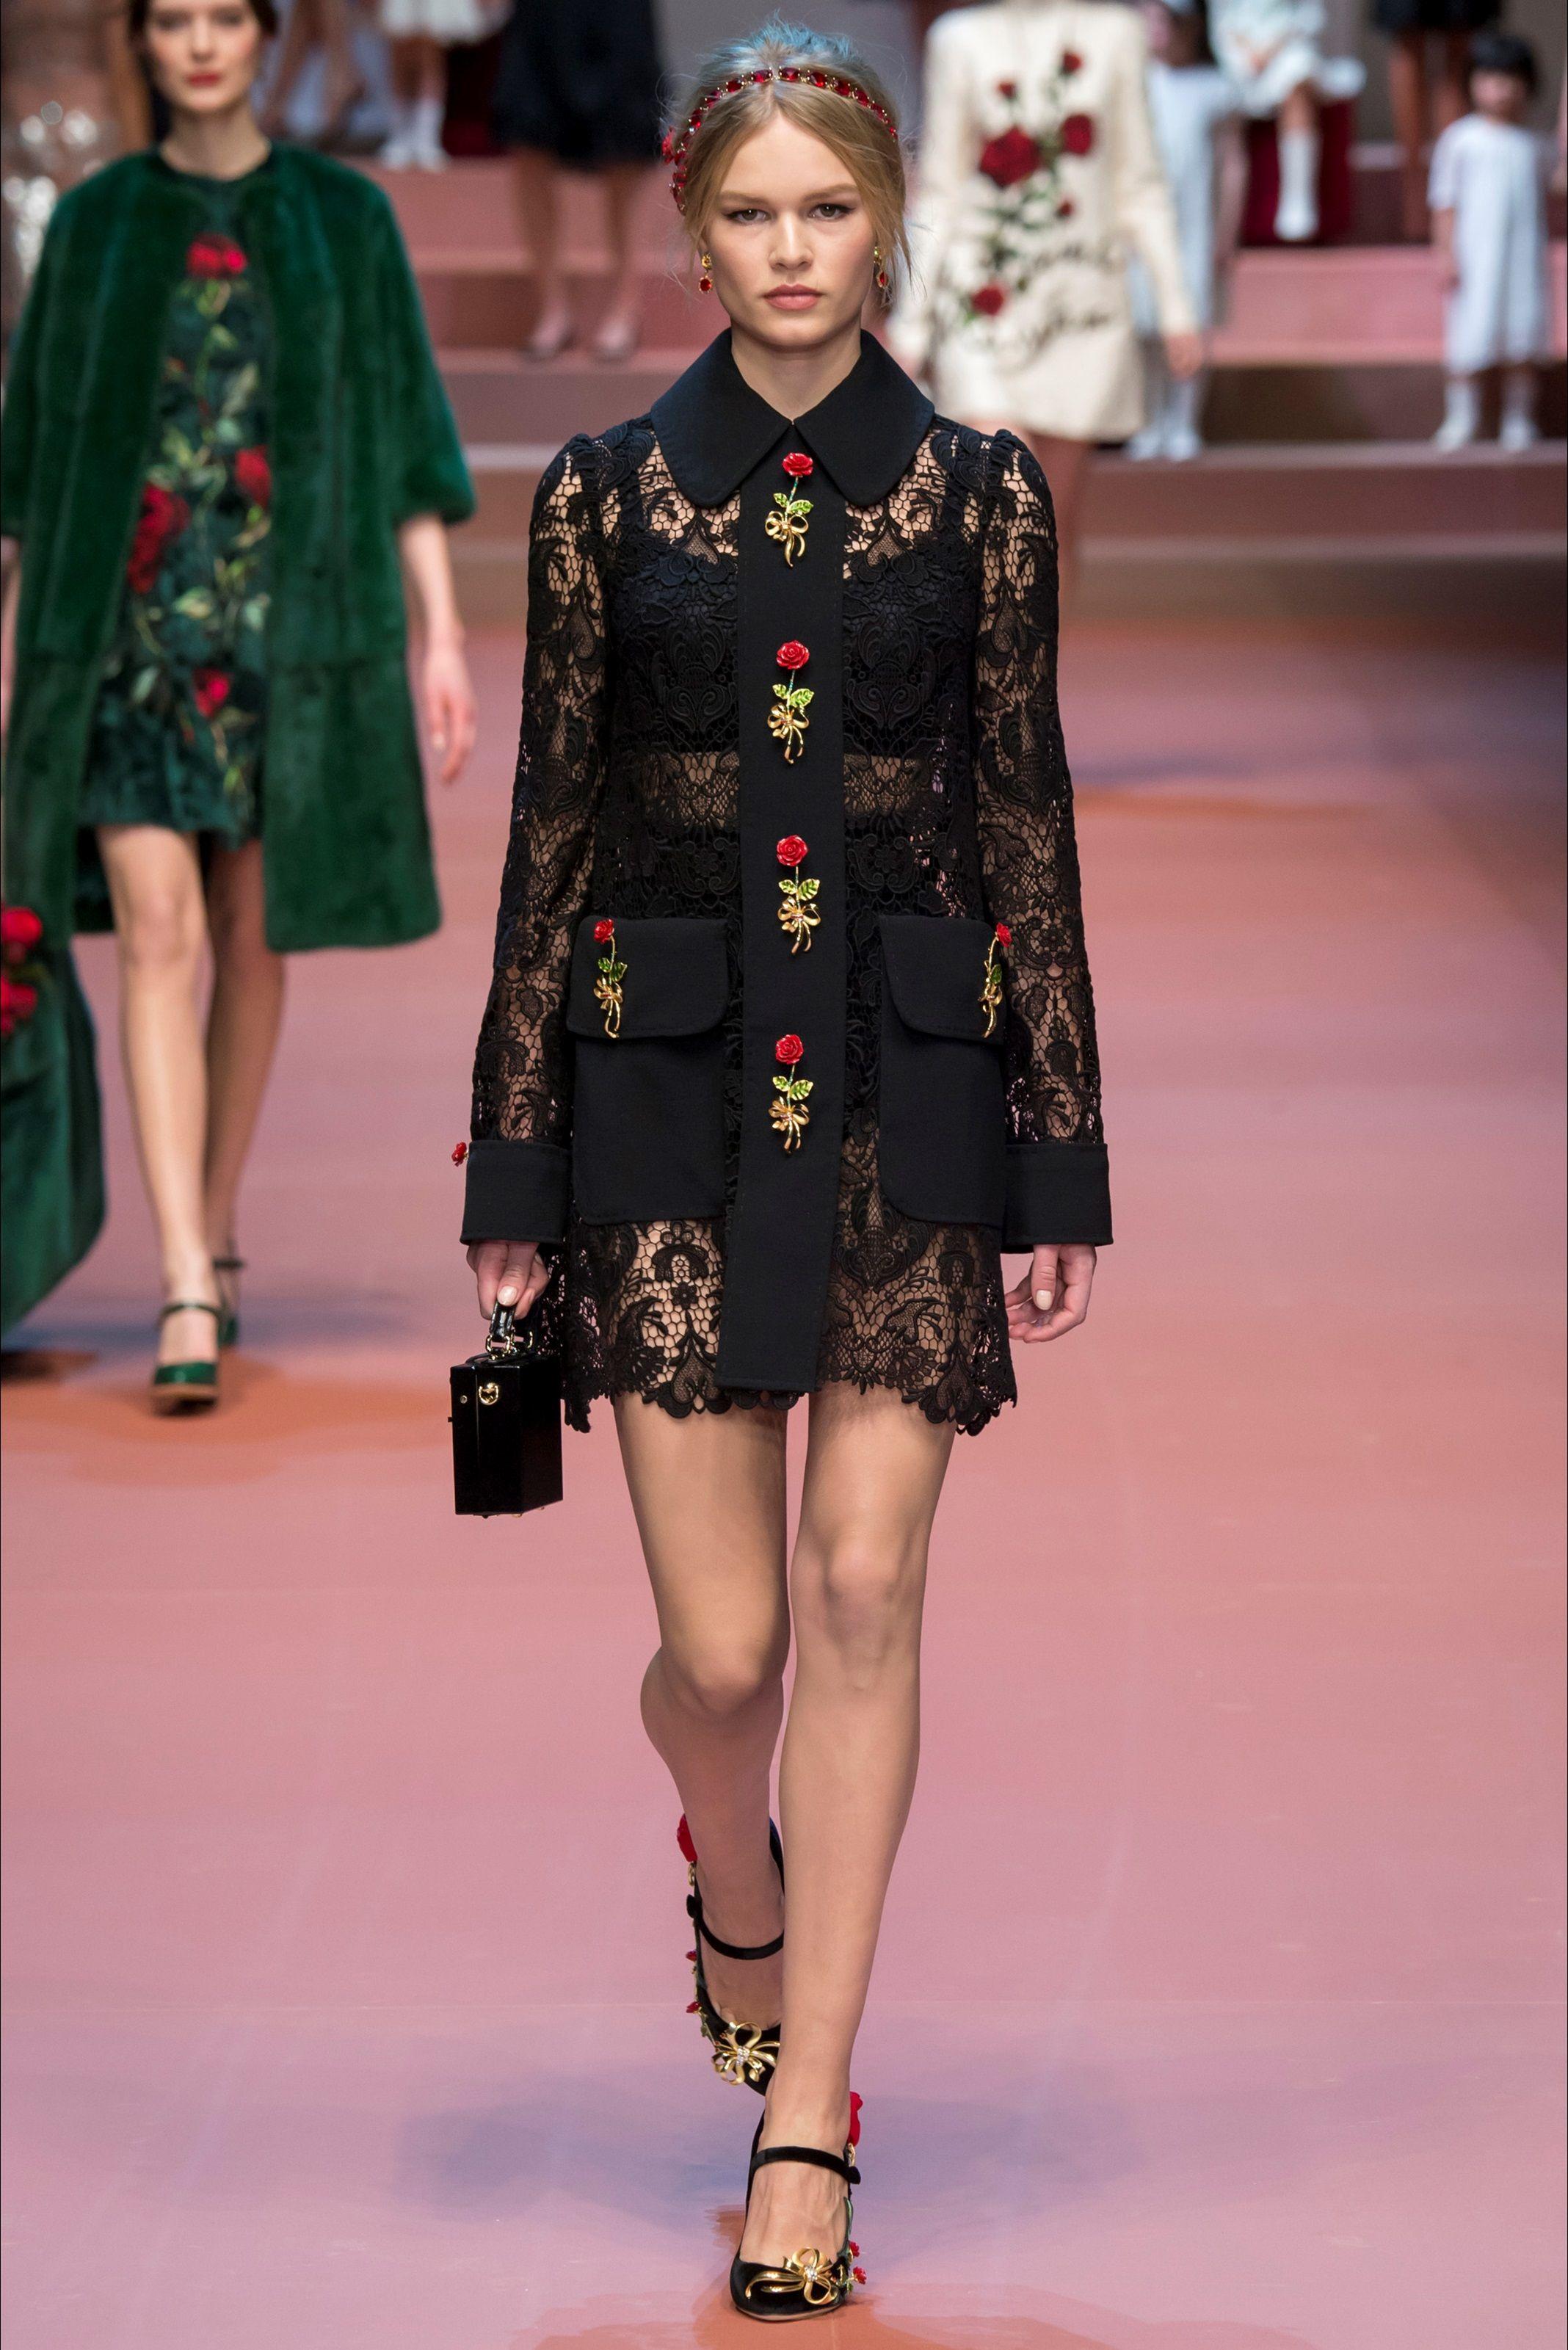 Dolce & Gabbana show de moda en Milán - Otoño Invierno 2015-16 ...